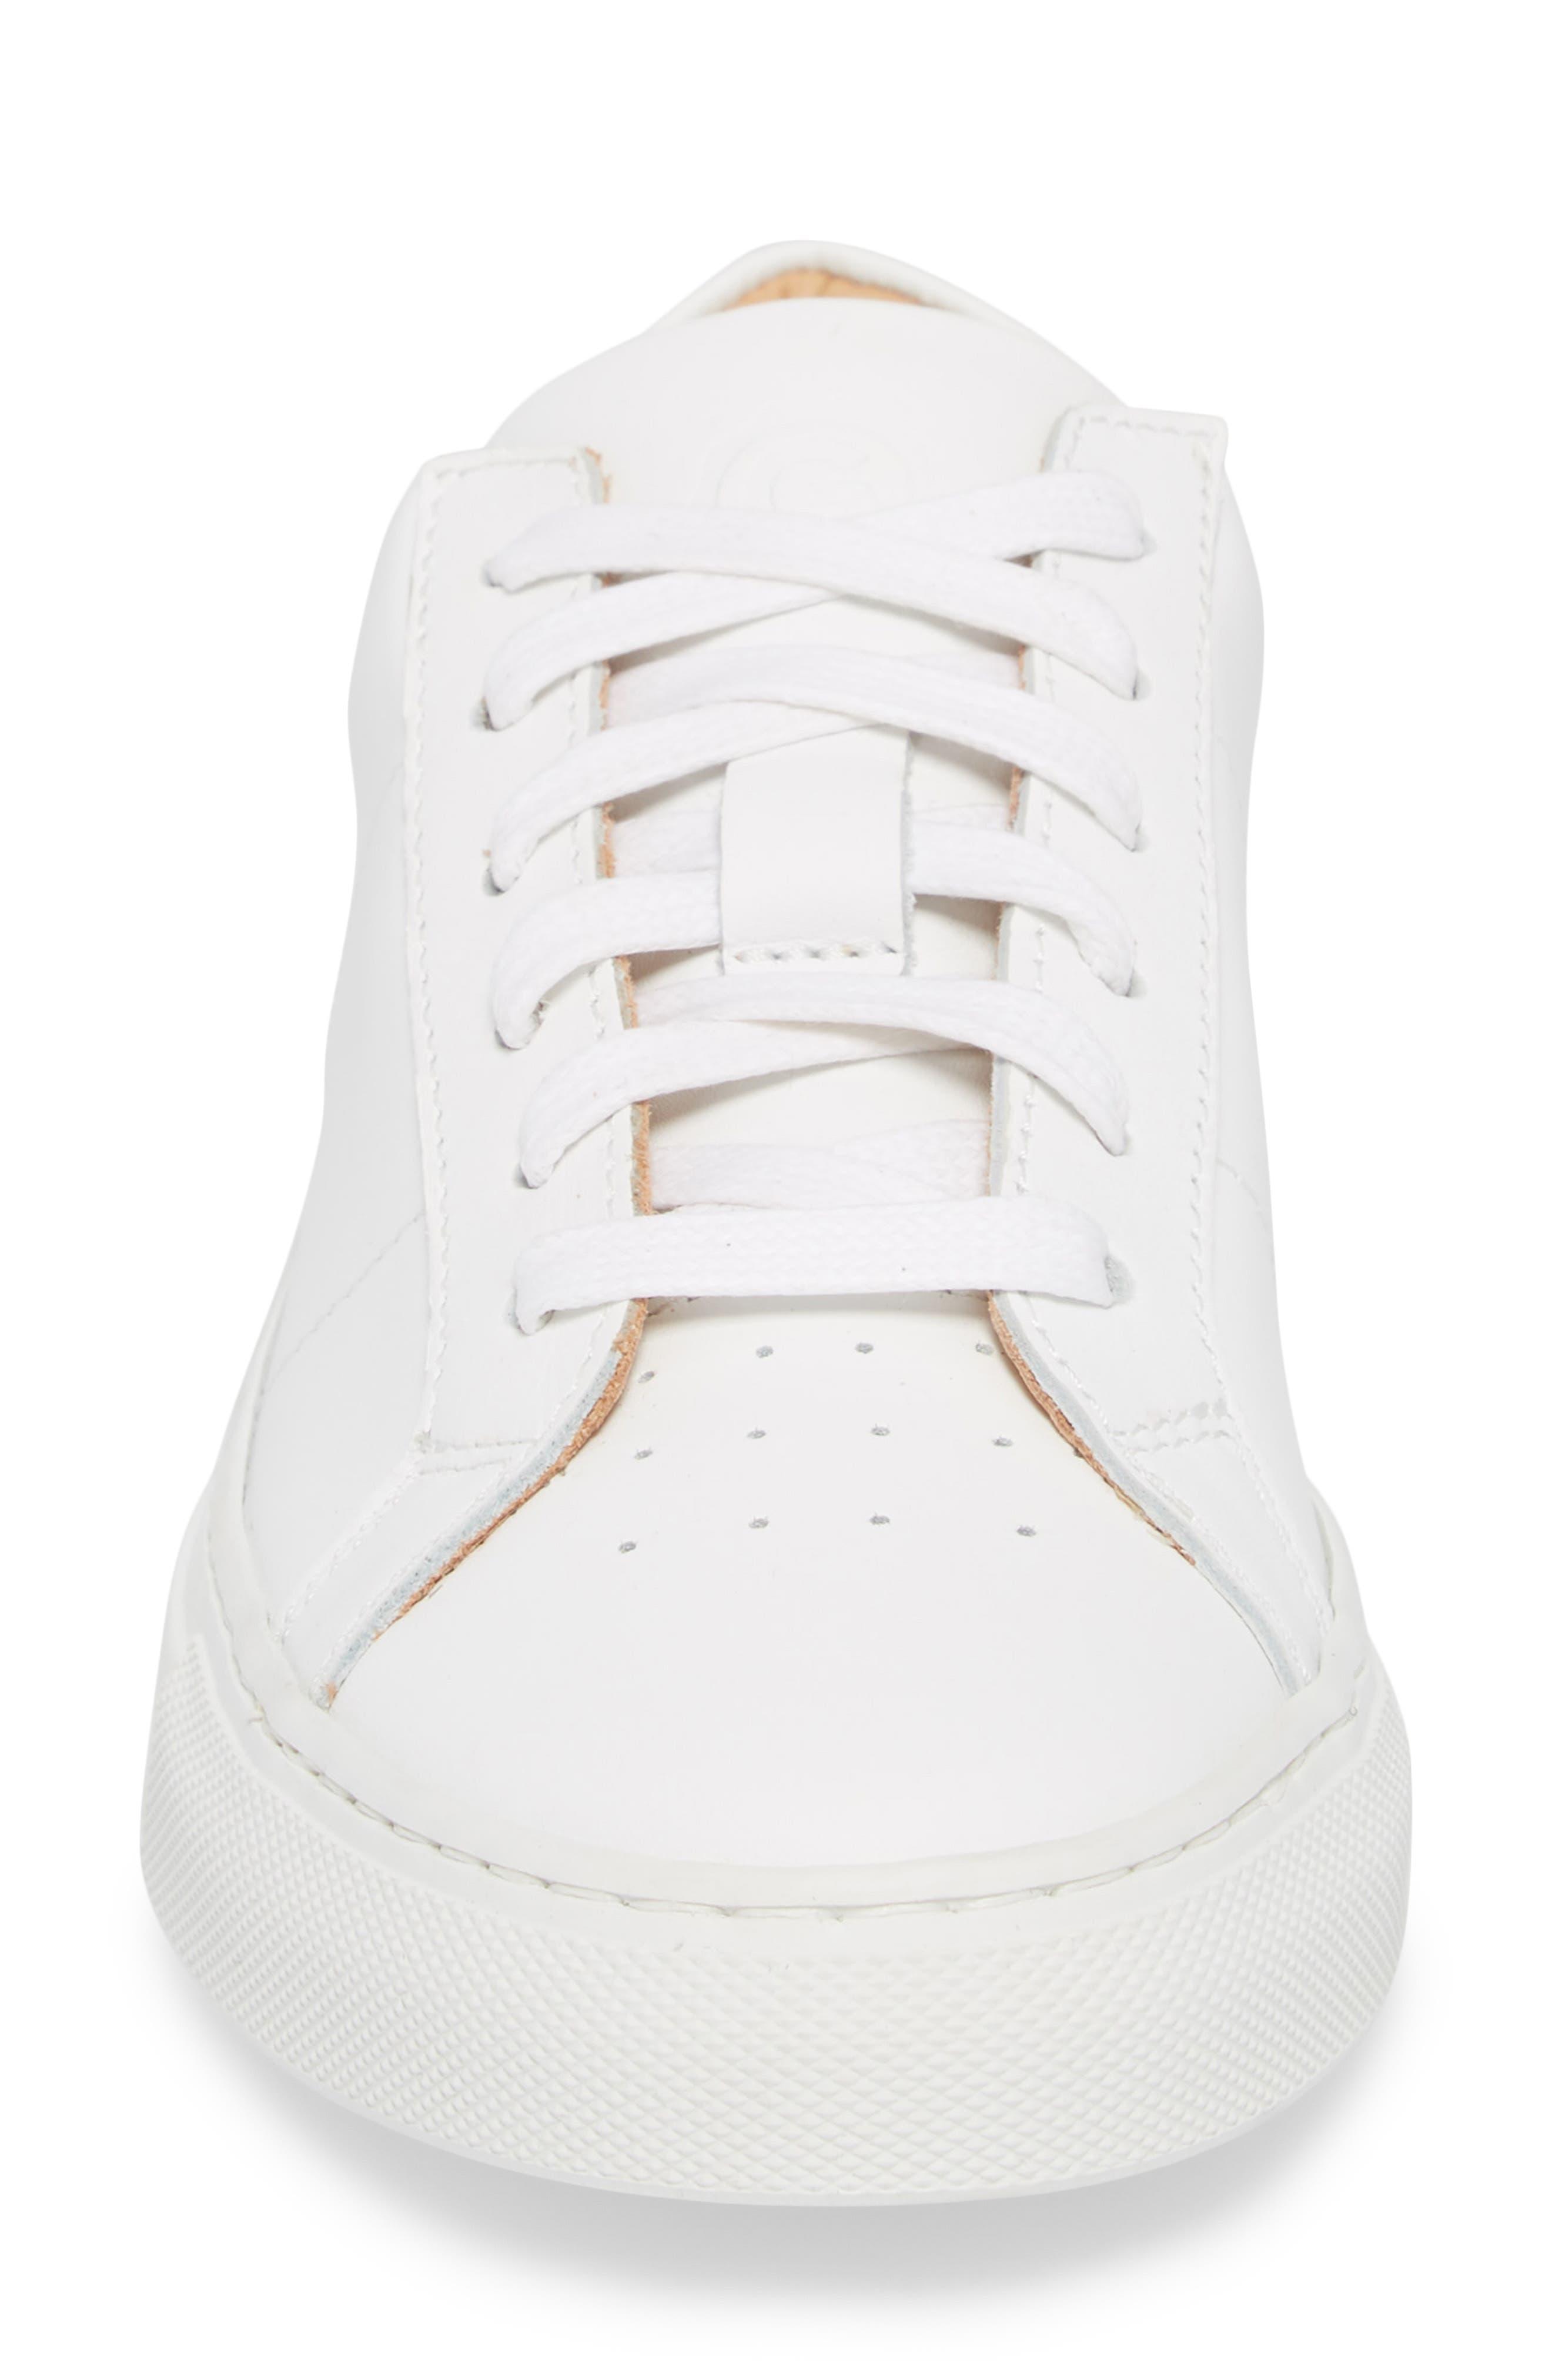 Royale Sneaker,                             Alternate thumbnail 4, color,